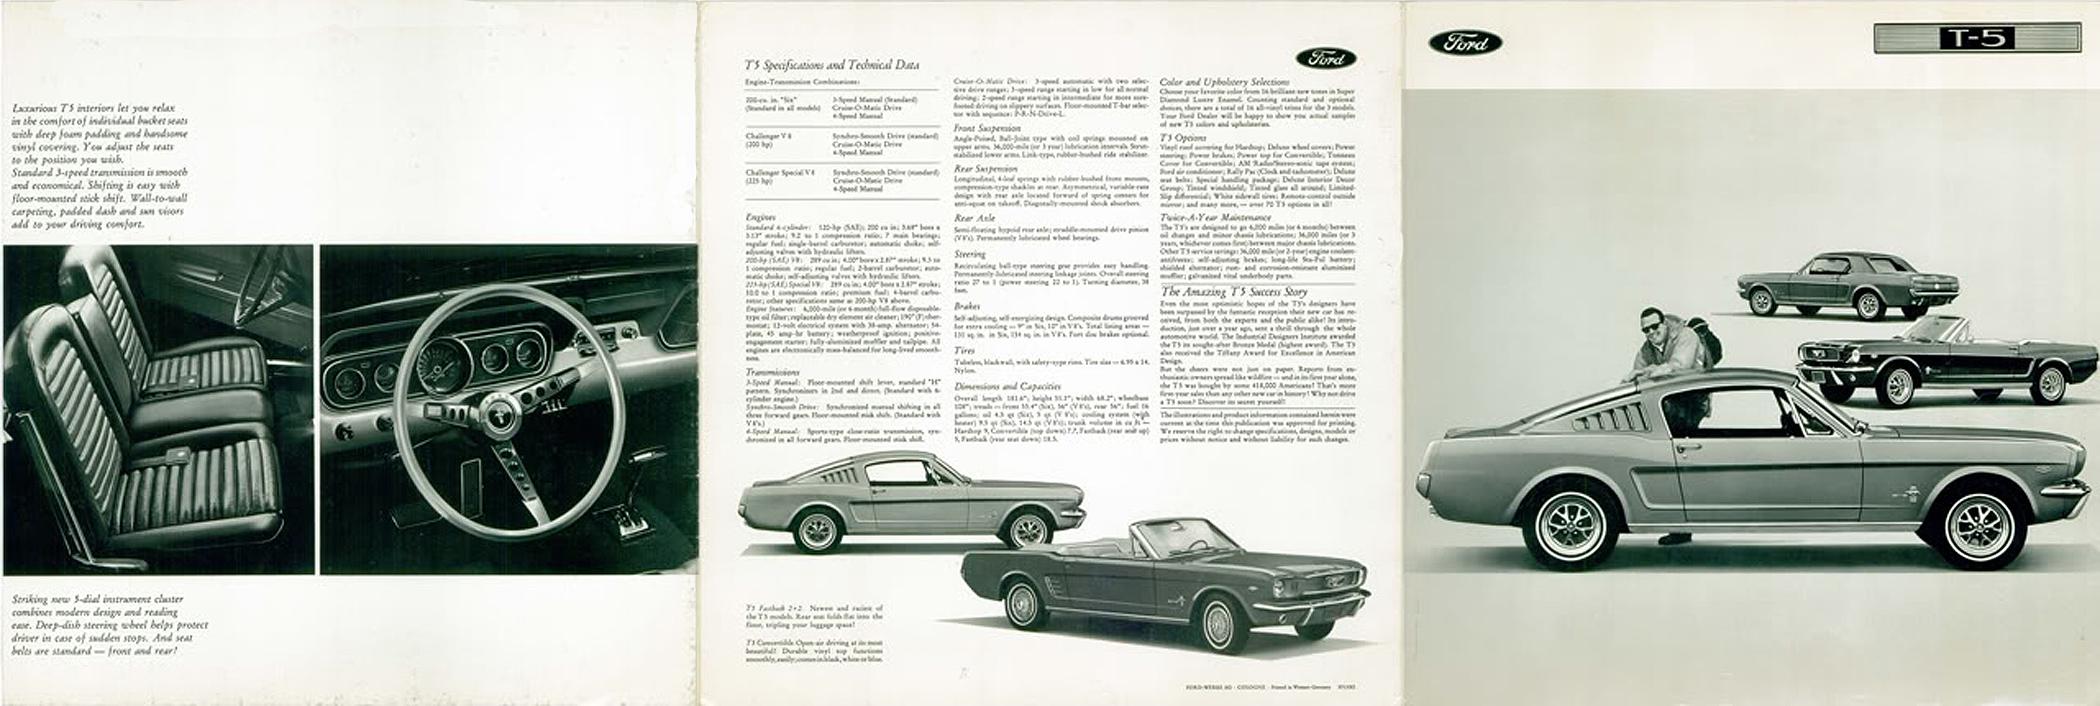 1966 Ford Mustang T5 Prospekt Englisch - Seite 1